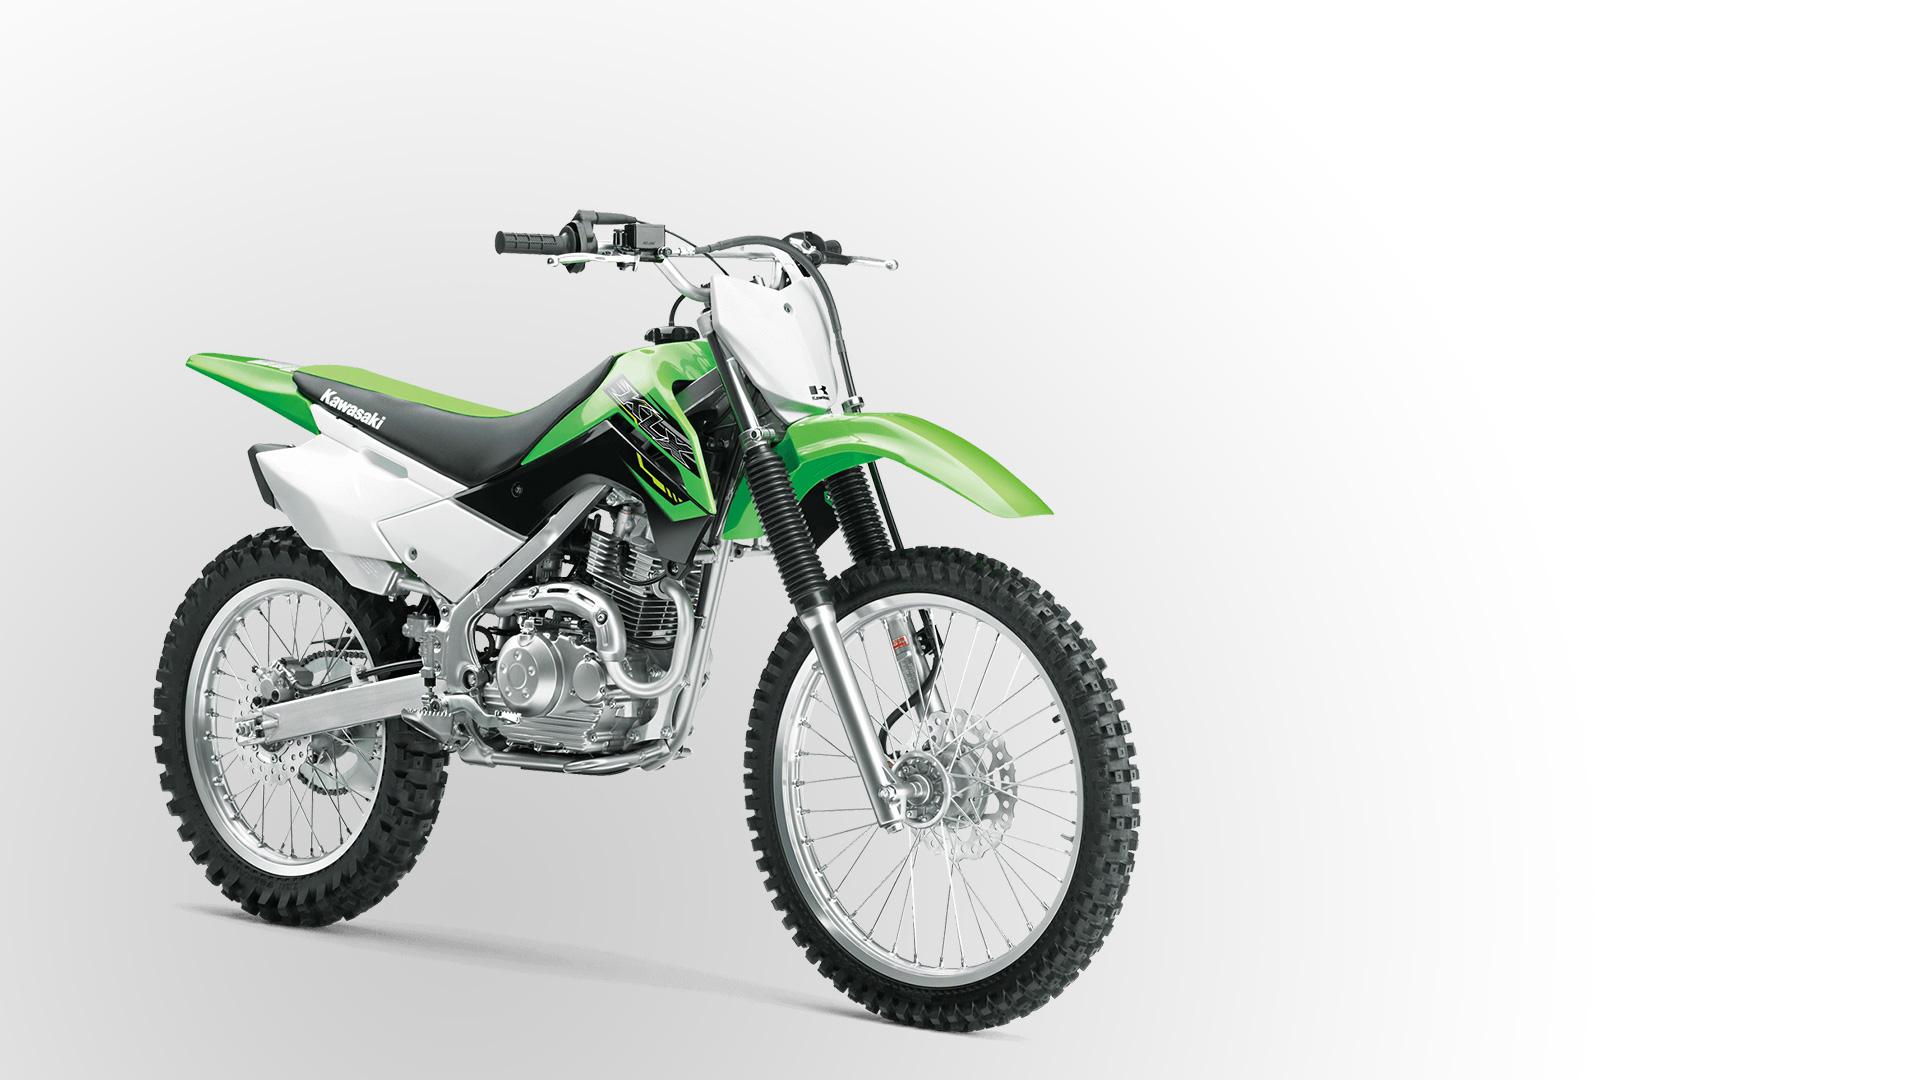 Kawasaki KLX140G 2019 STD